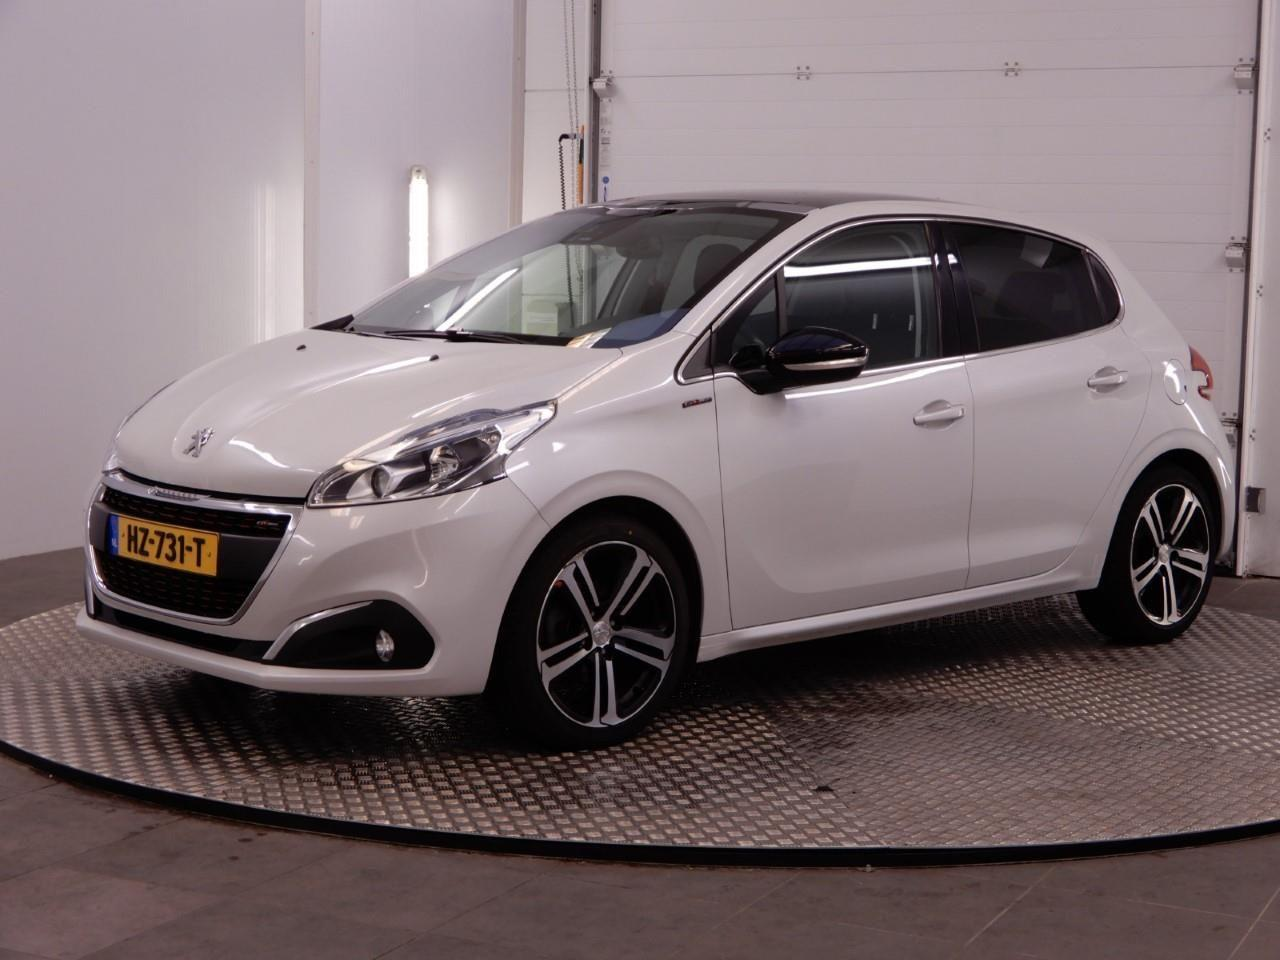 Peugeot 208 1.6 bluehdi gt-line *pano+1/2leder+navi+jbl-sound+ecc+pdc+cruise*